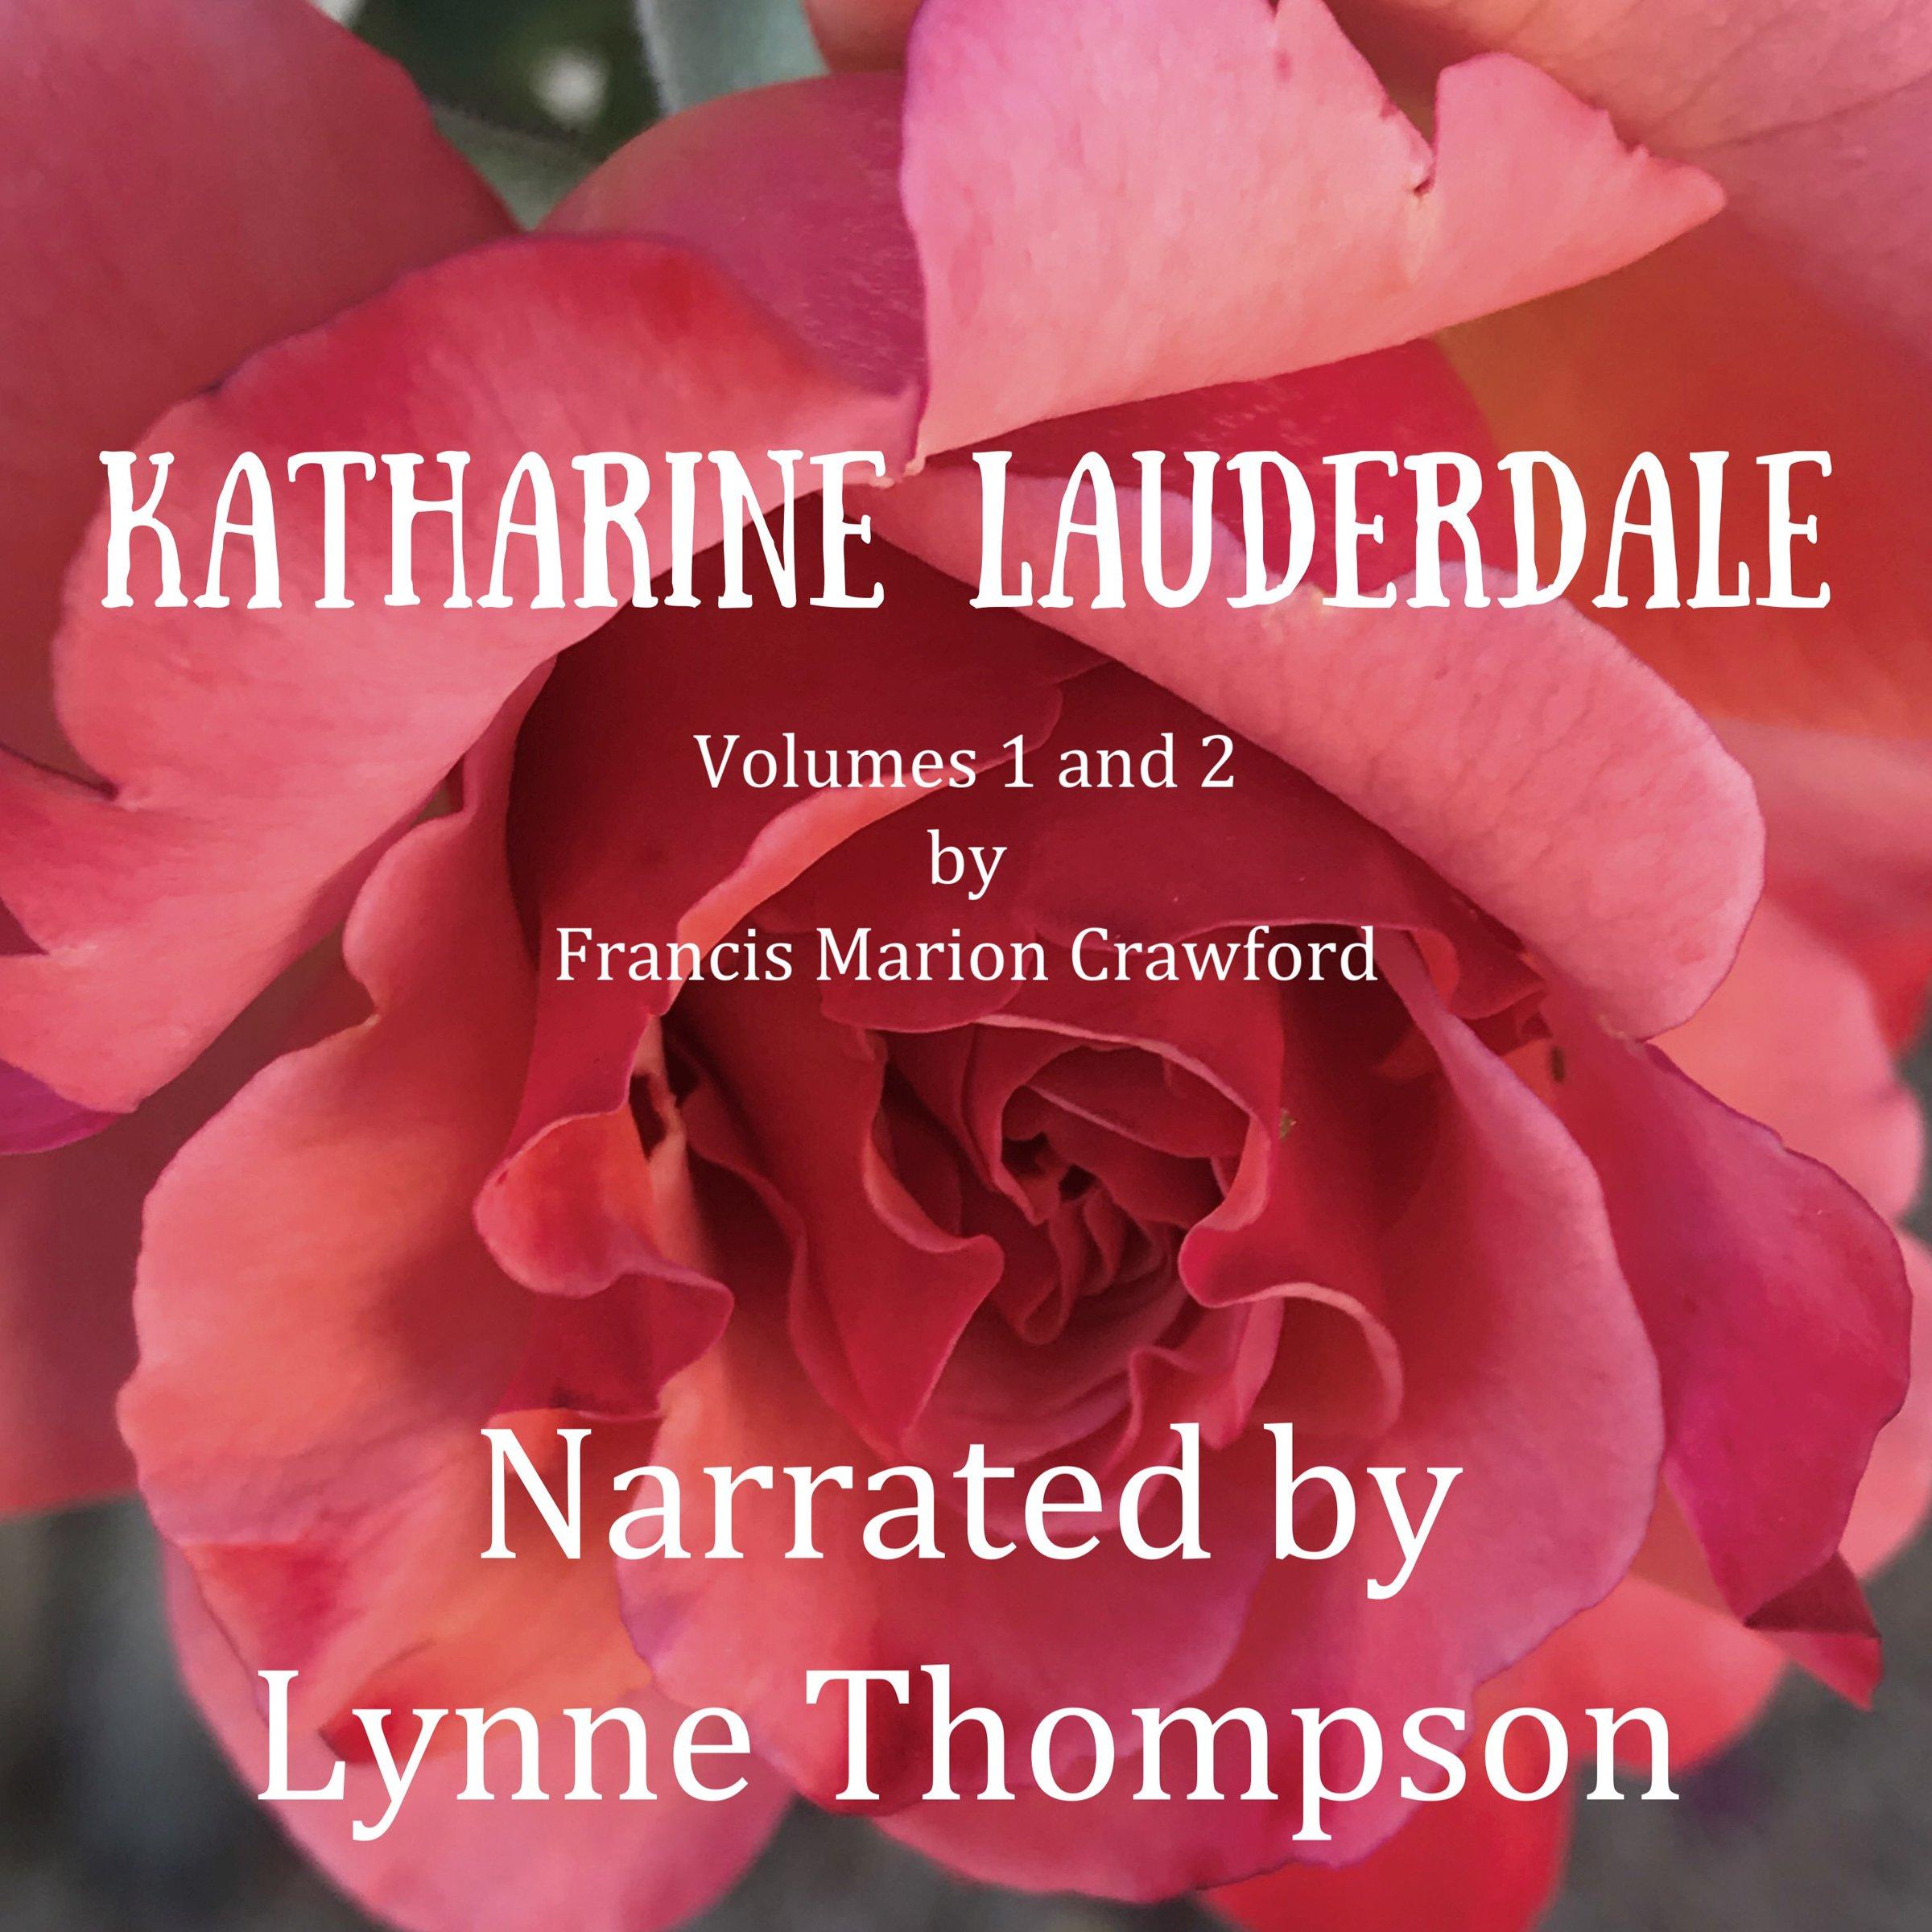 Katharine Lauderdale: Volumes 1 and 2